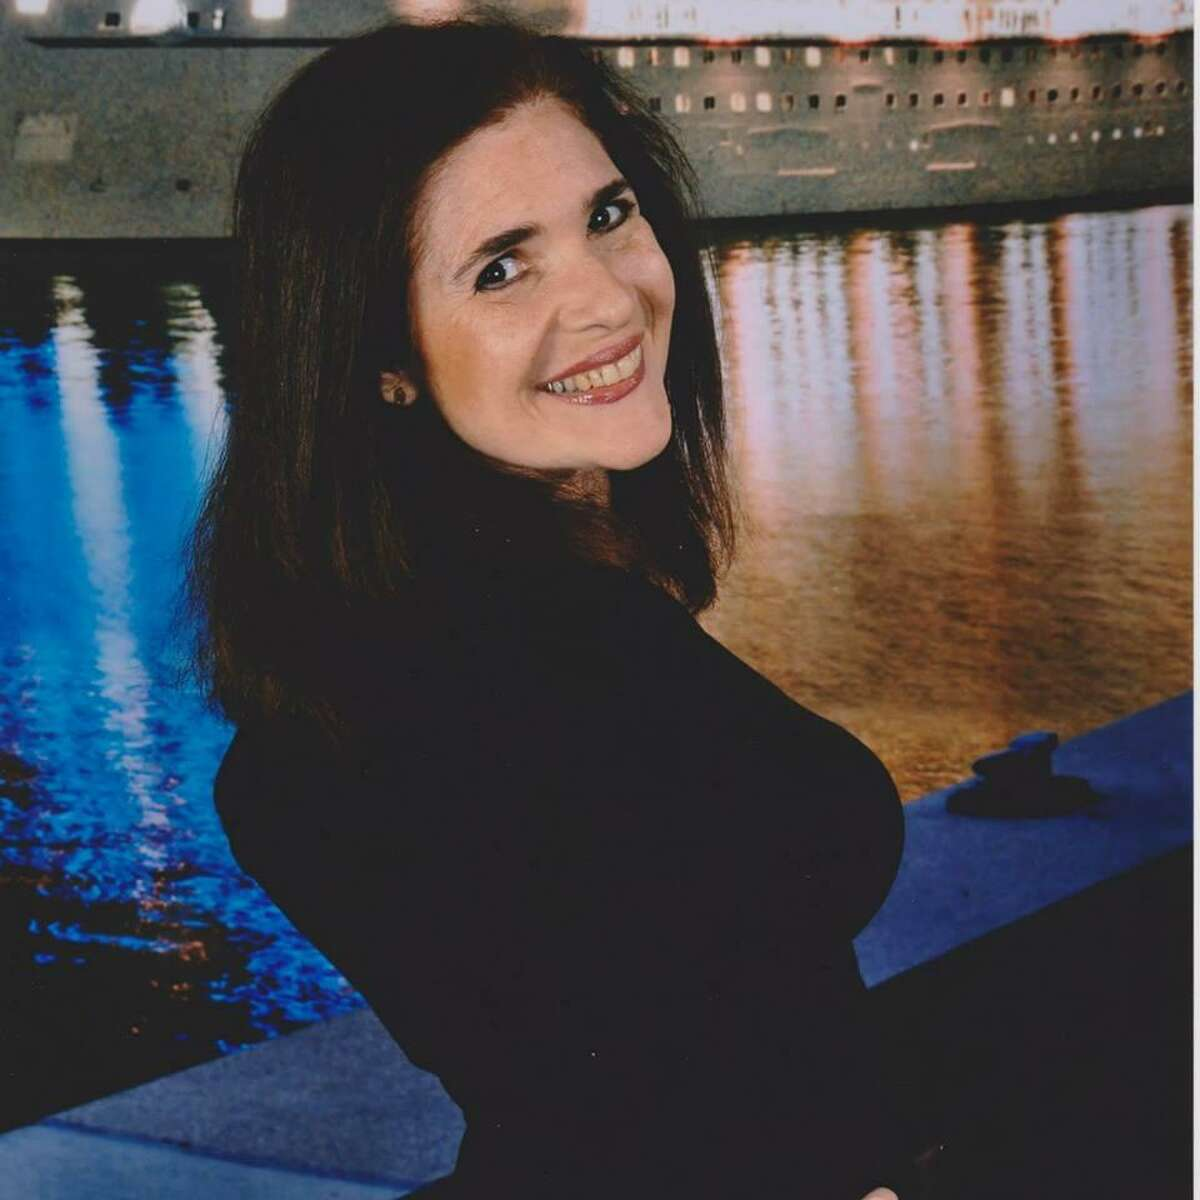 Houston author Andrya Bailey